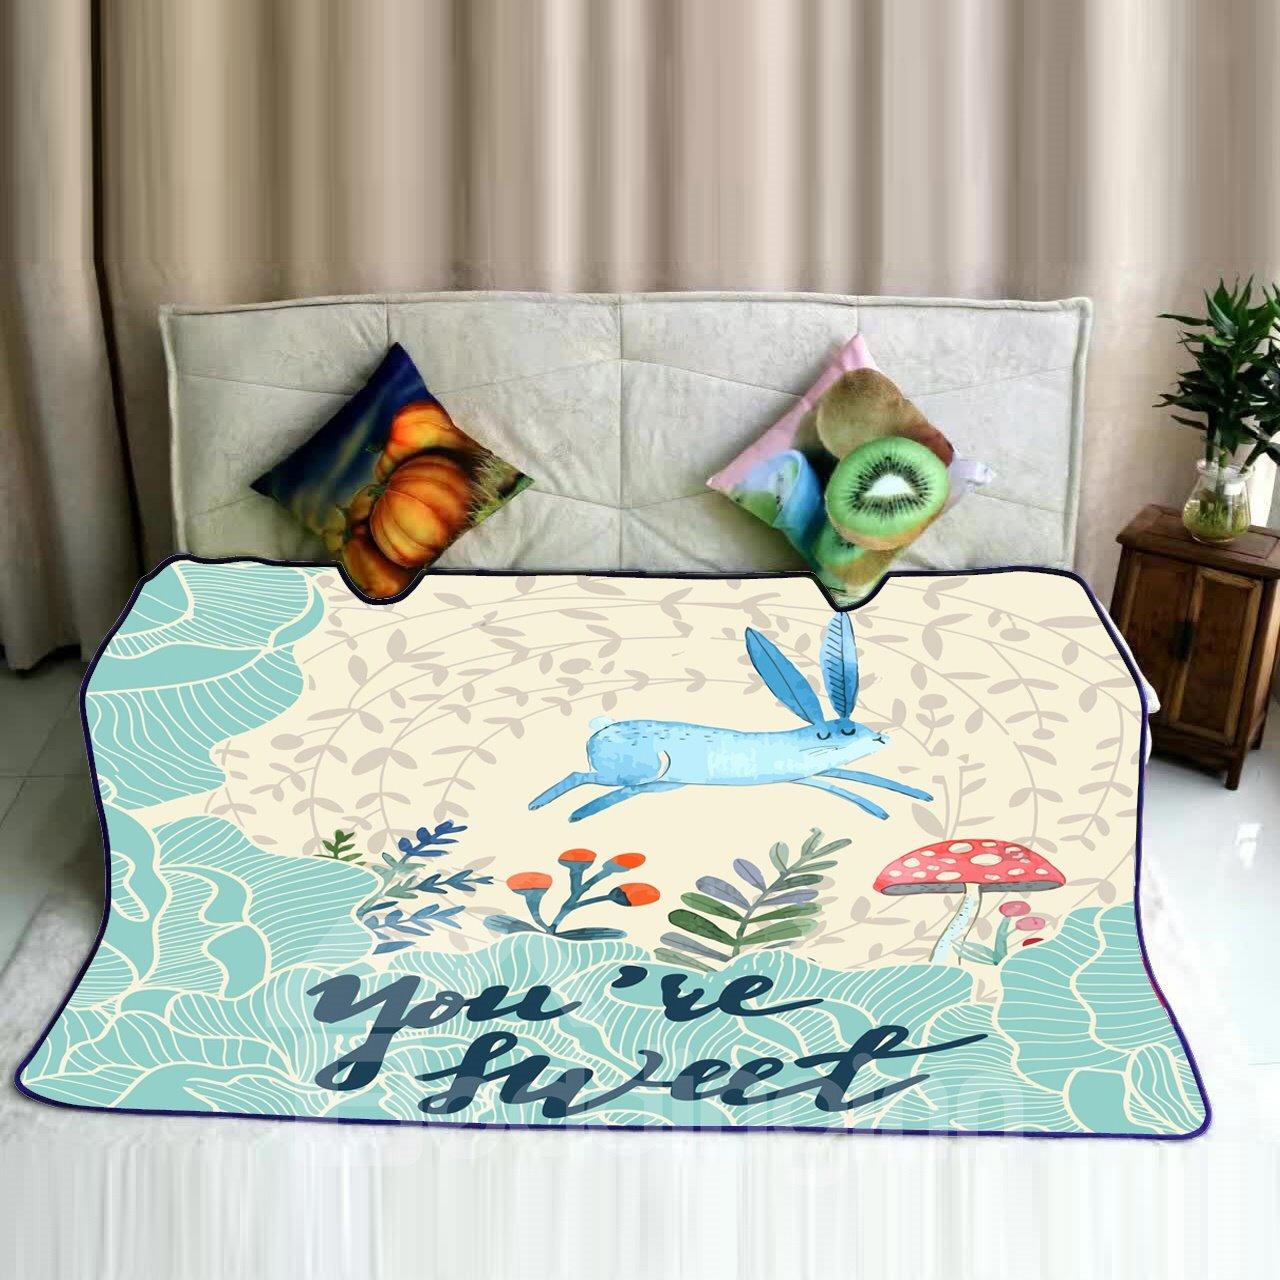 Cartoon Blue Rabbit Jumping and Mushroom Pattern Flannel Bed Blankets